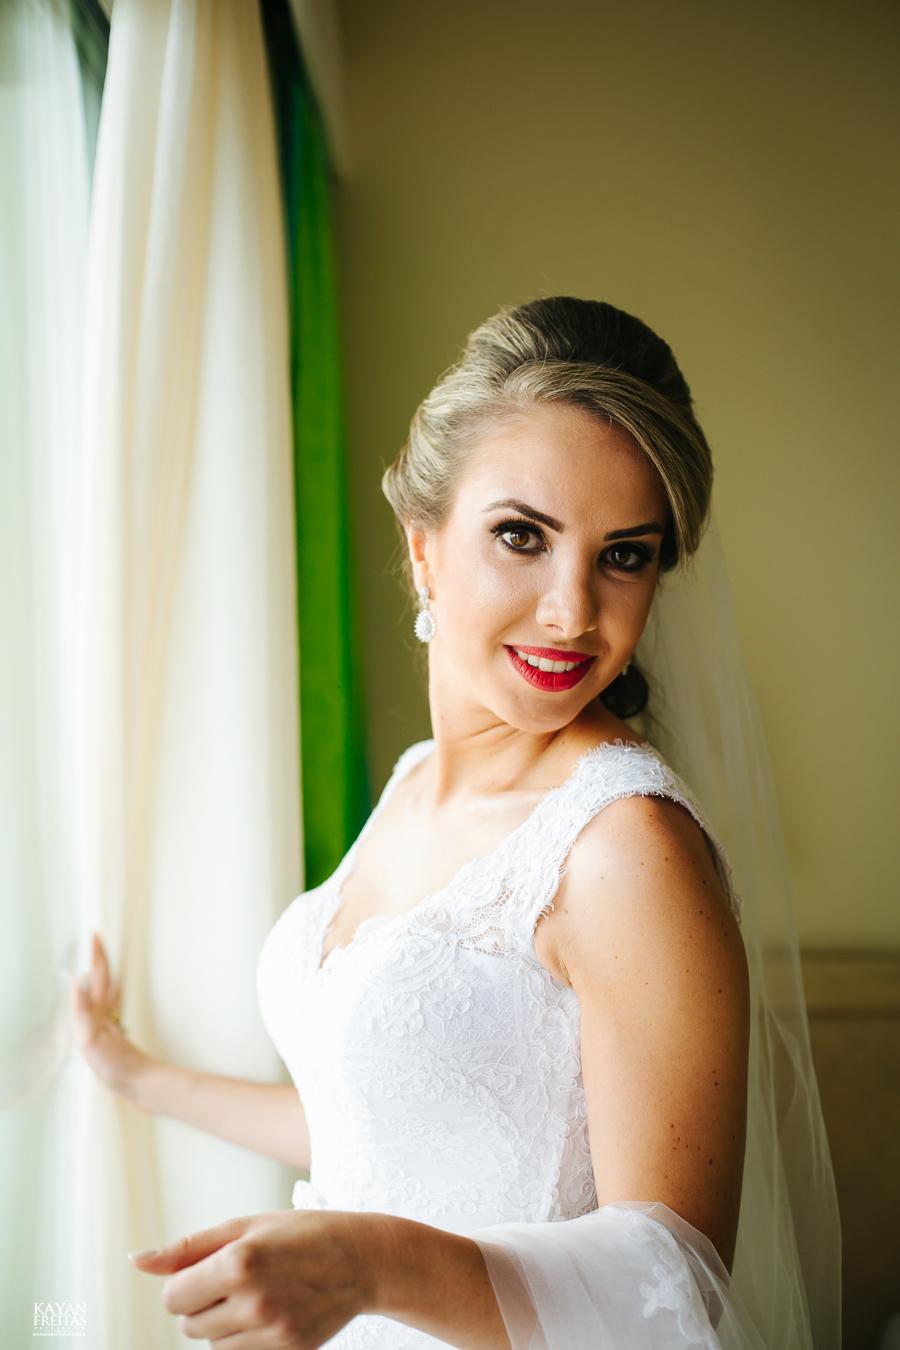 casamento-floripa-gui-mari-0042 Casamento Mariana e Guilherme - Hotel Costa Norte Florianópolis